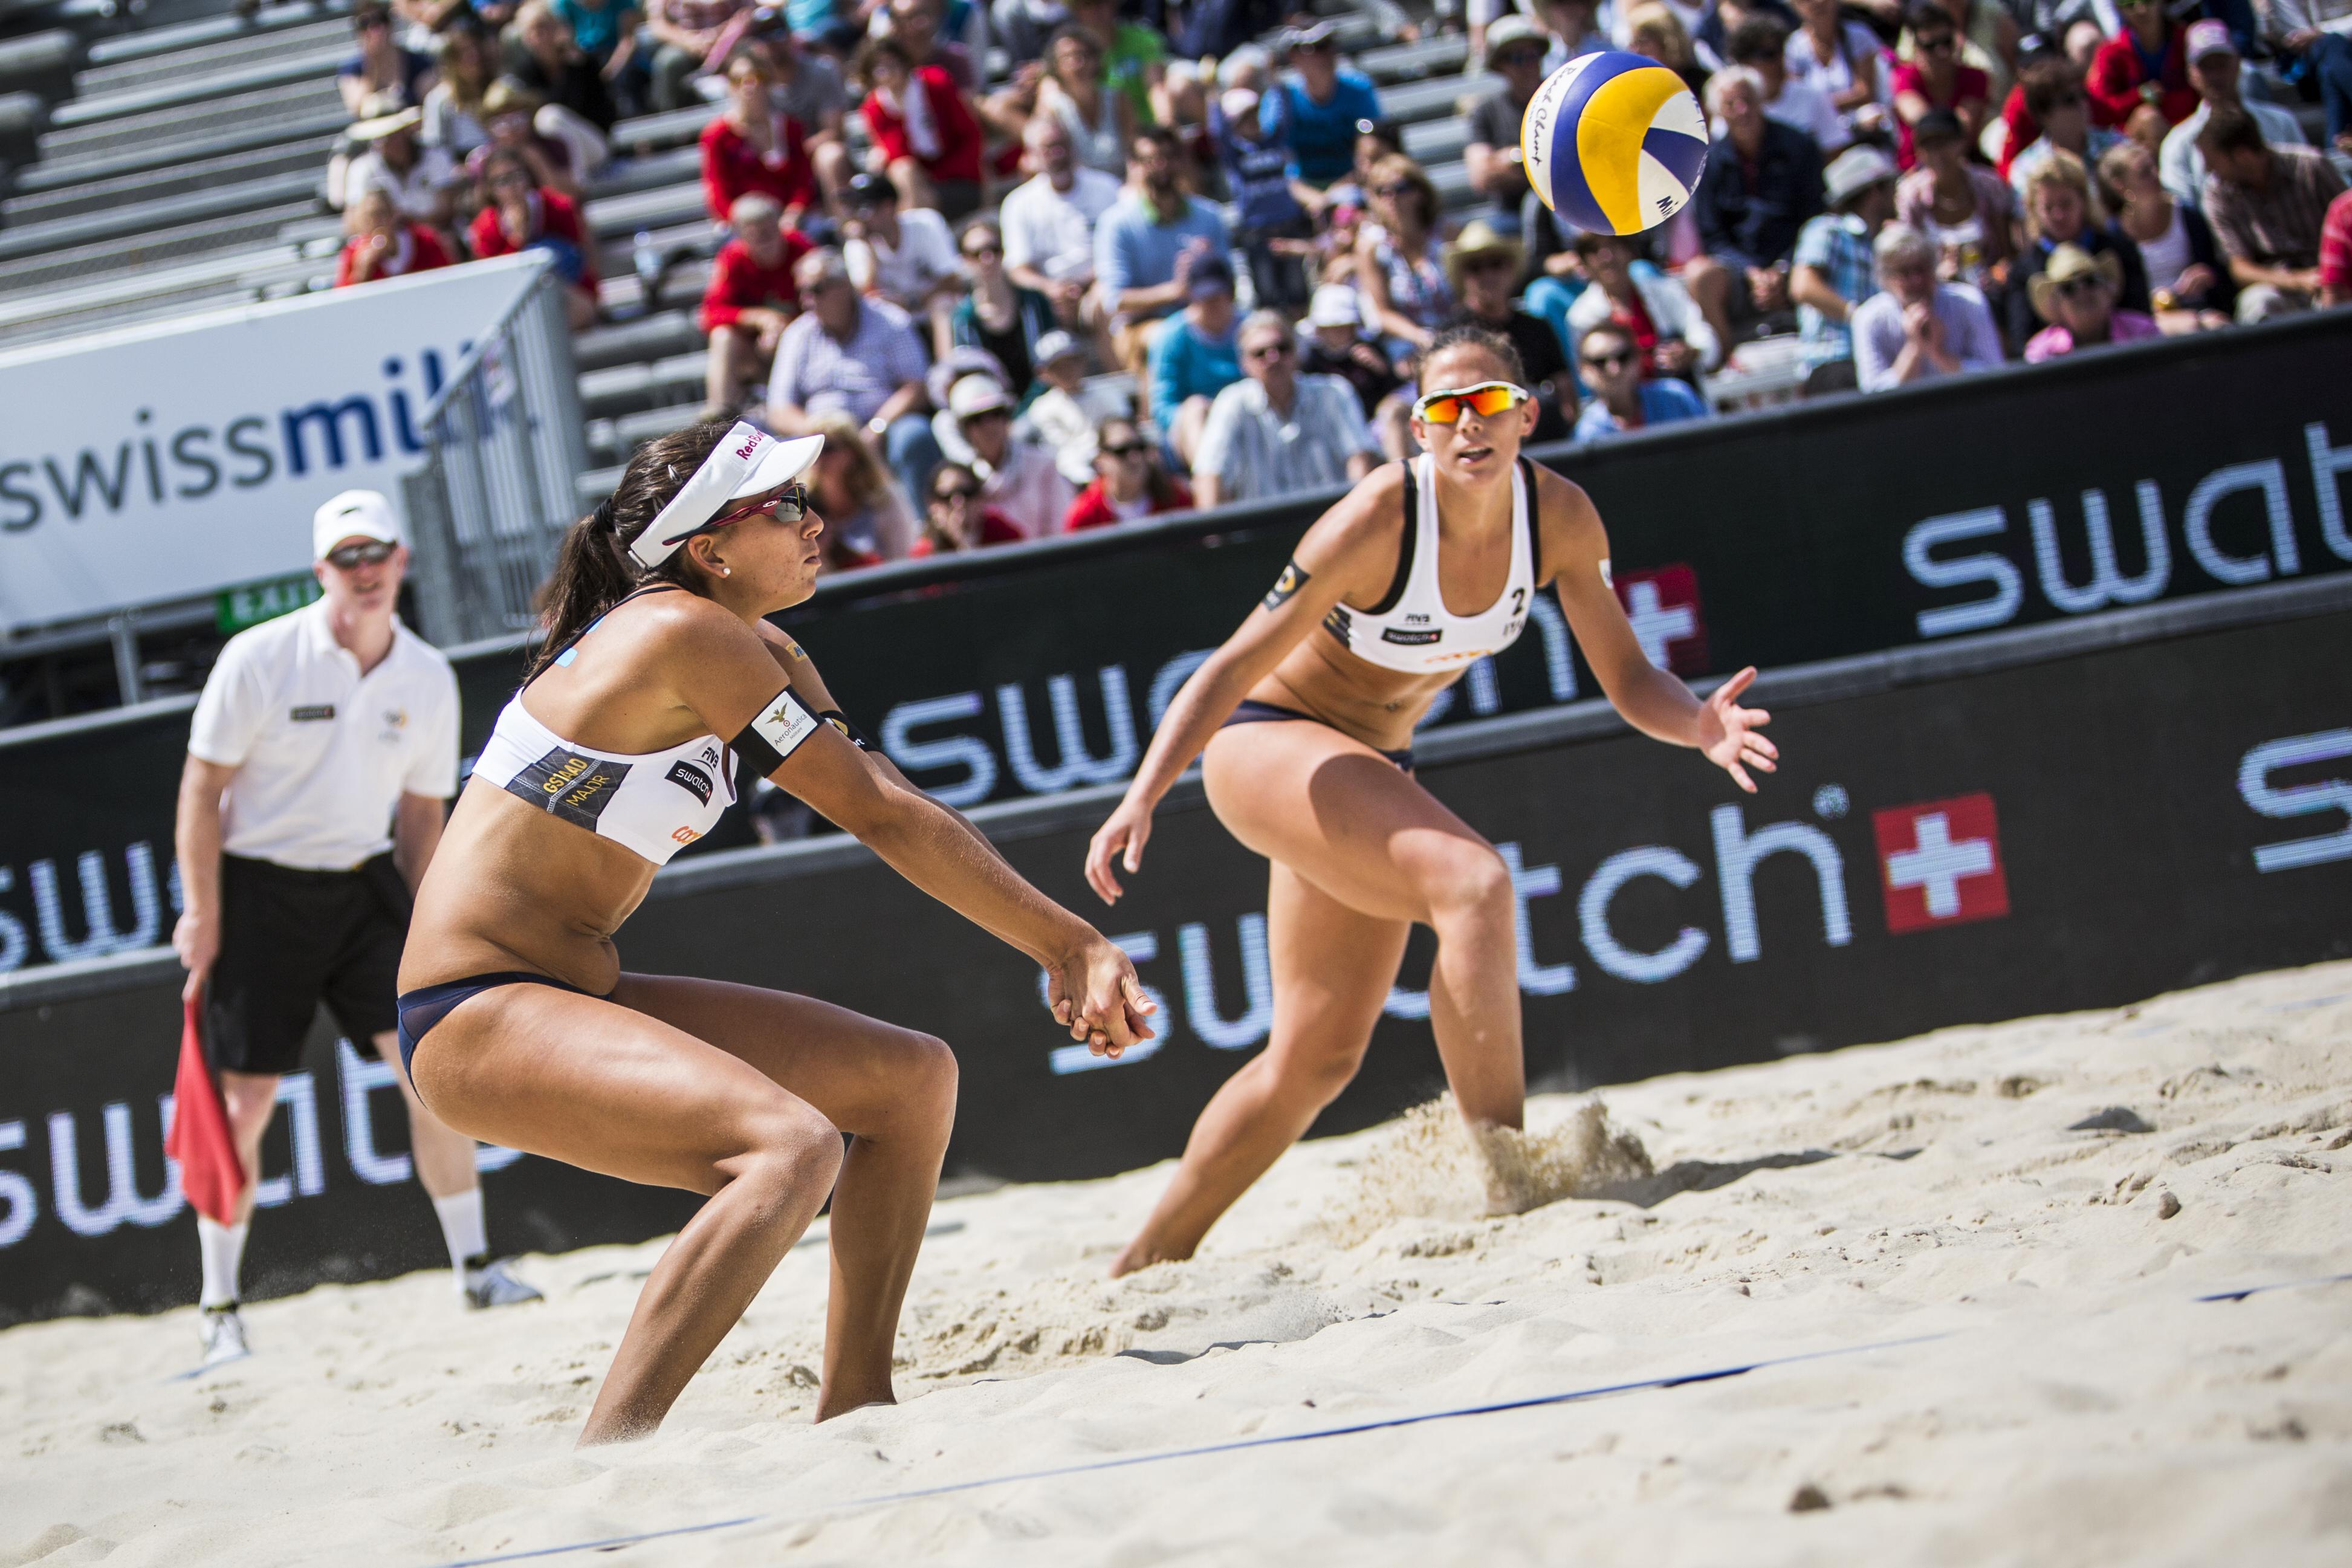 Menegatti Beach volley